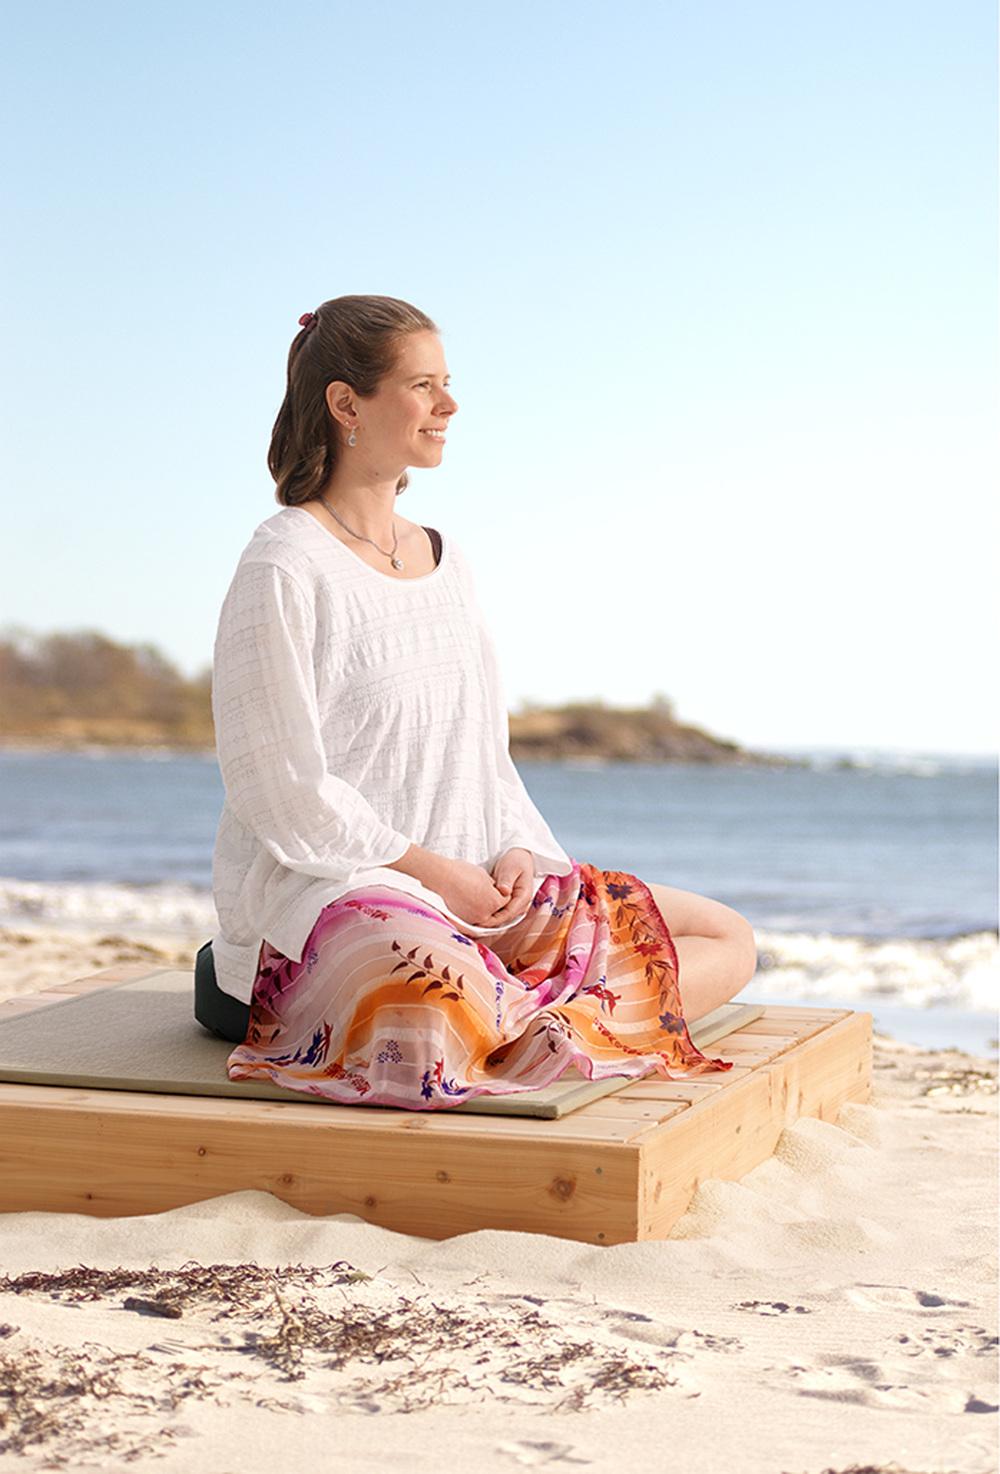 Beach Meditation_2Kpx.jpg